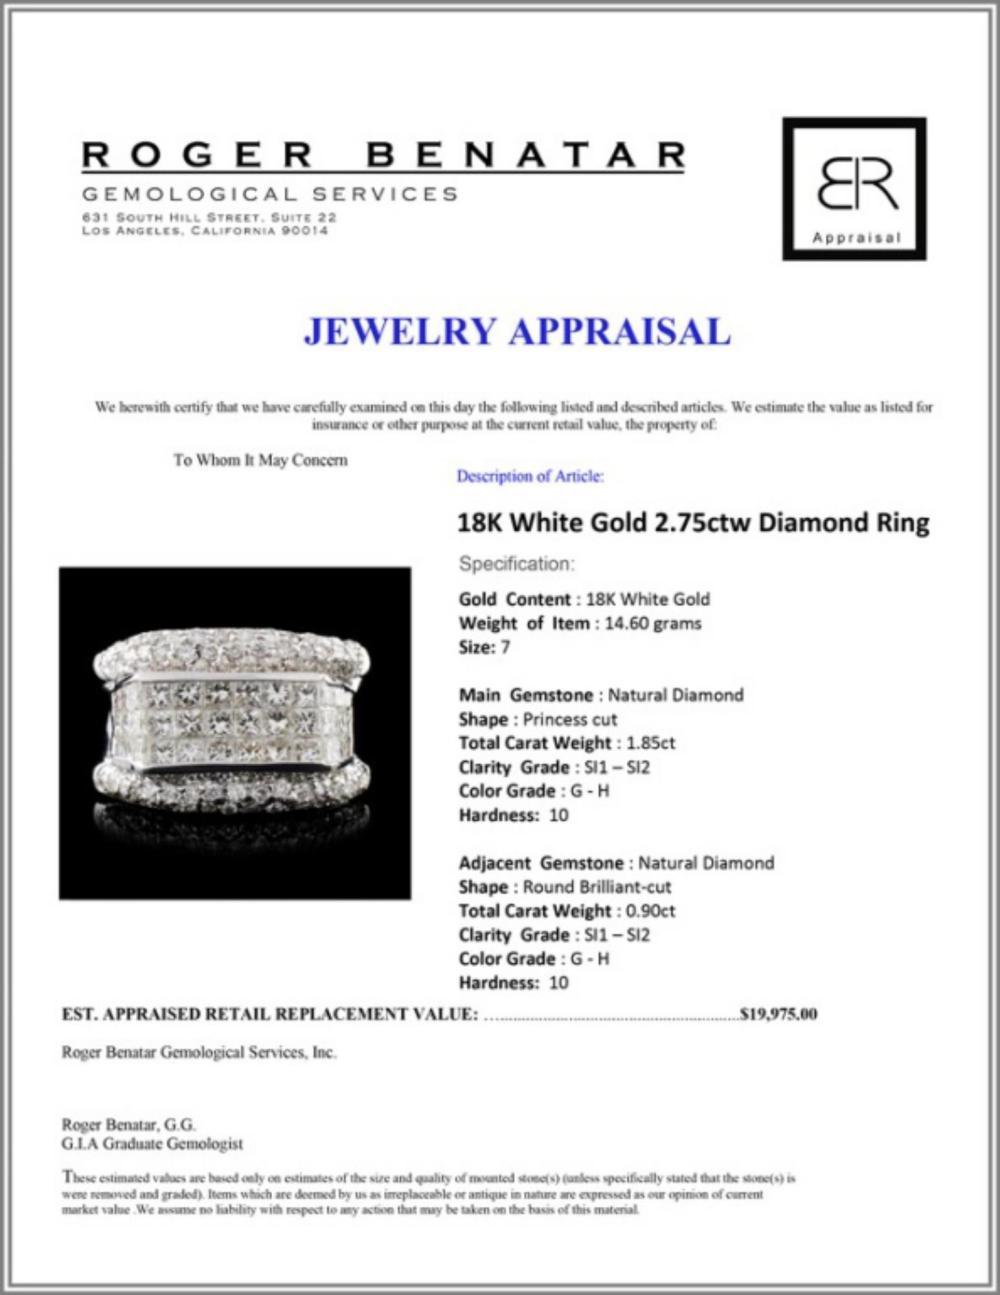 Lot 20: 18K White Gold 2.75ctw Diamond Ring